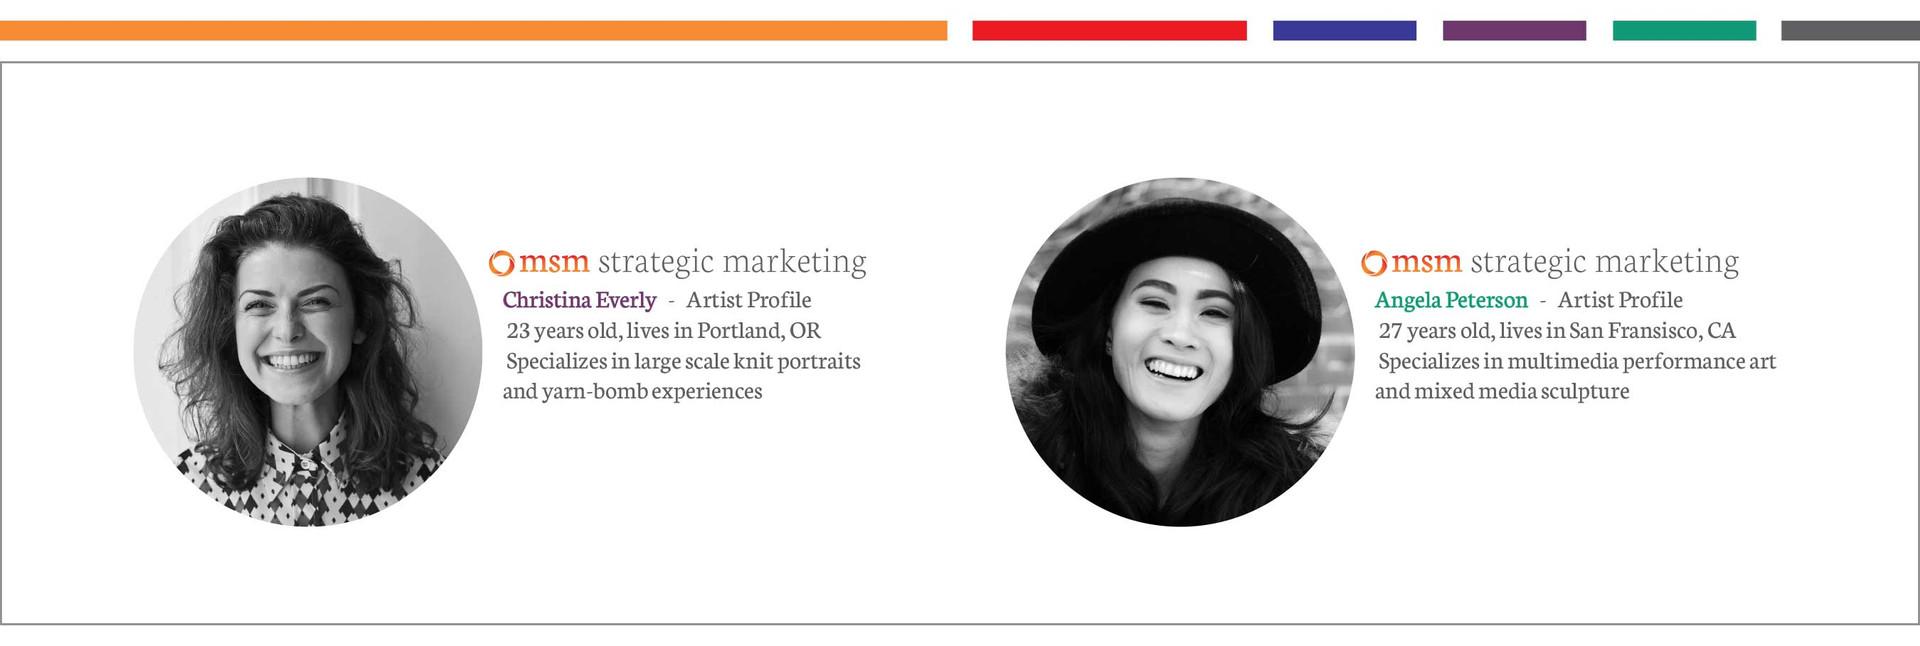 artist profiles and color scheme